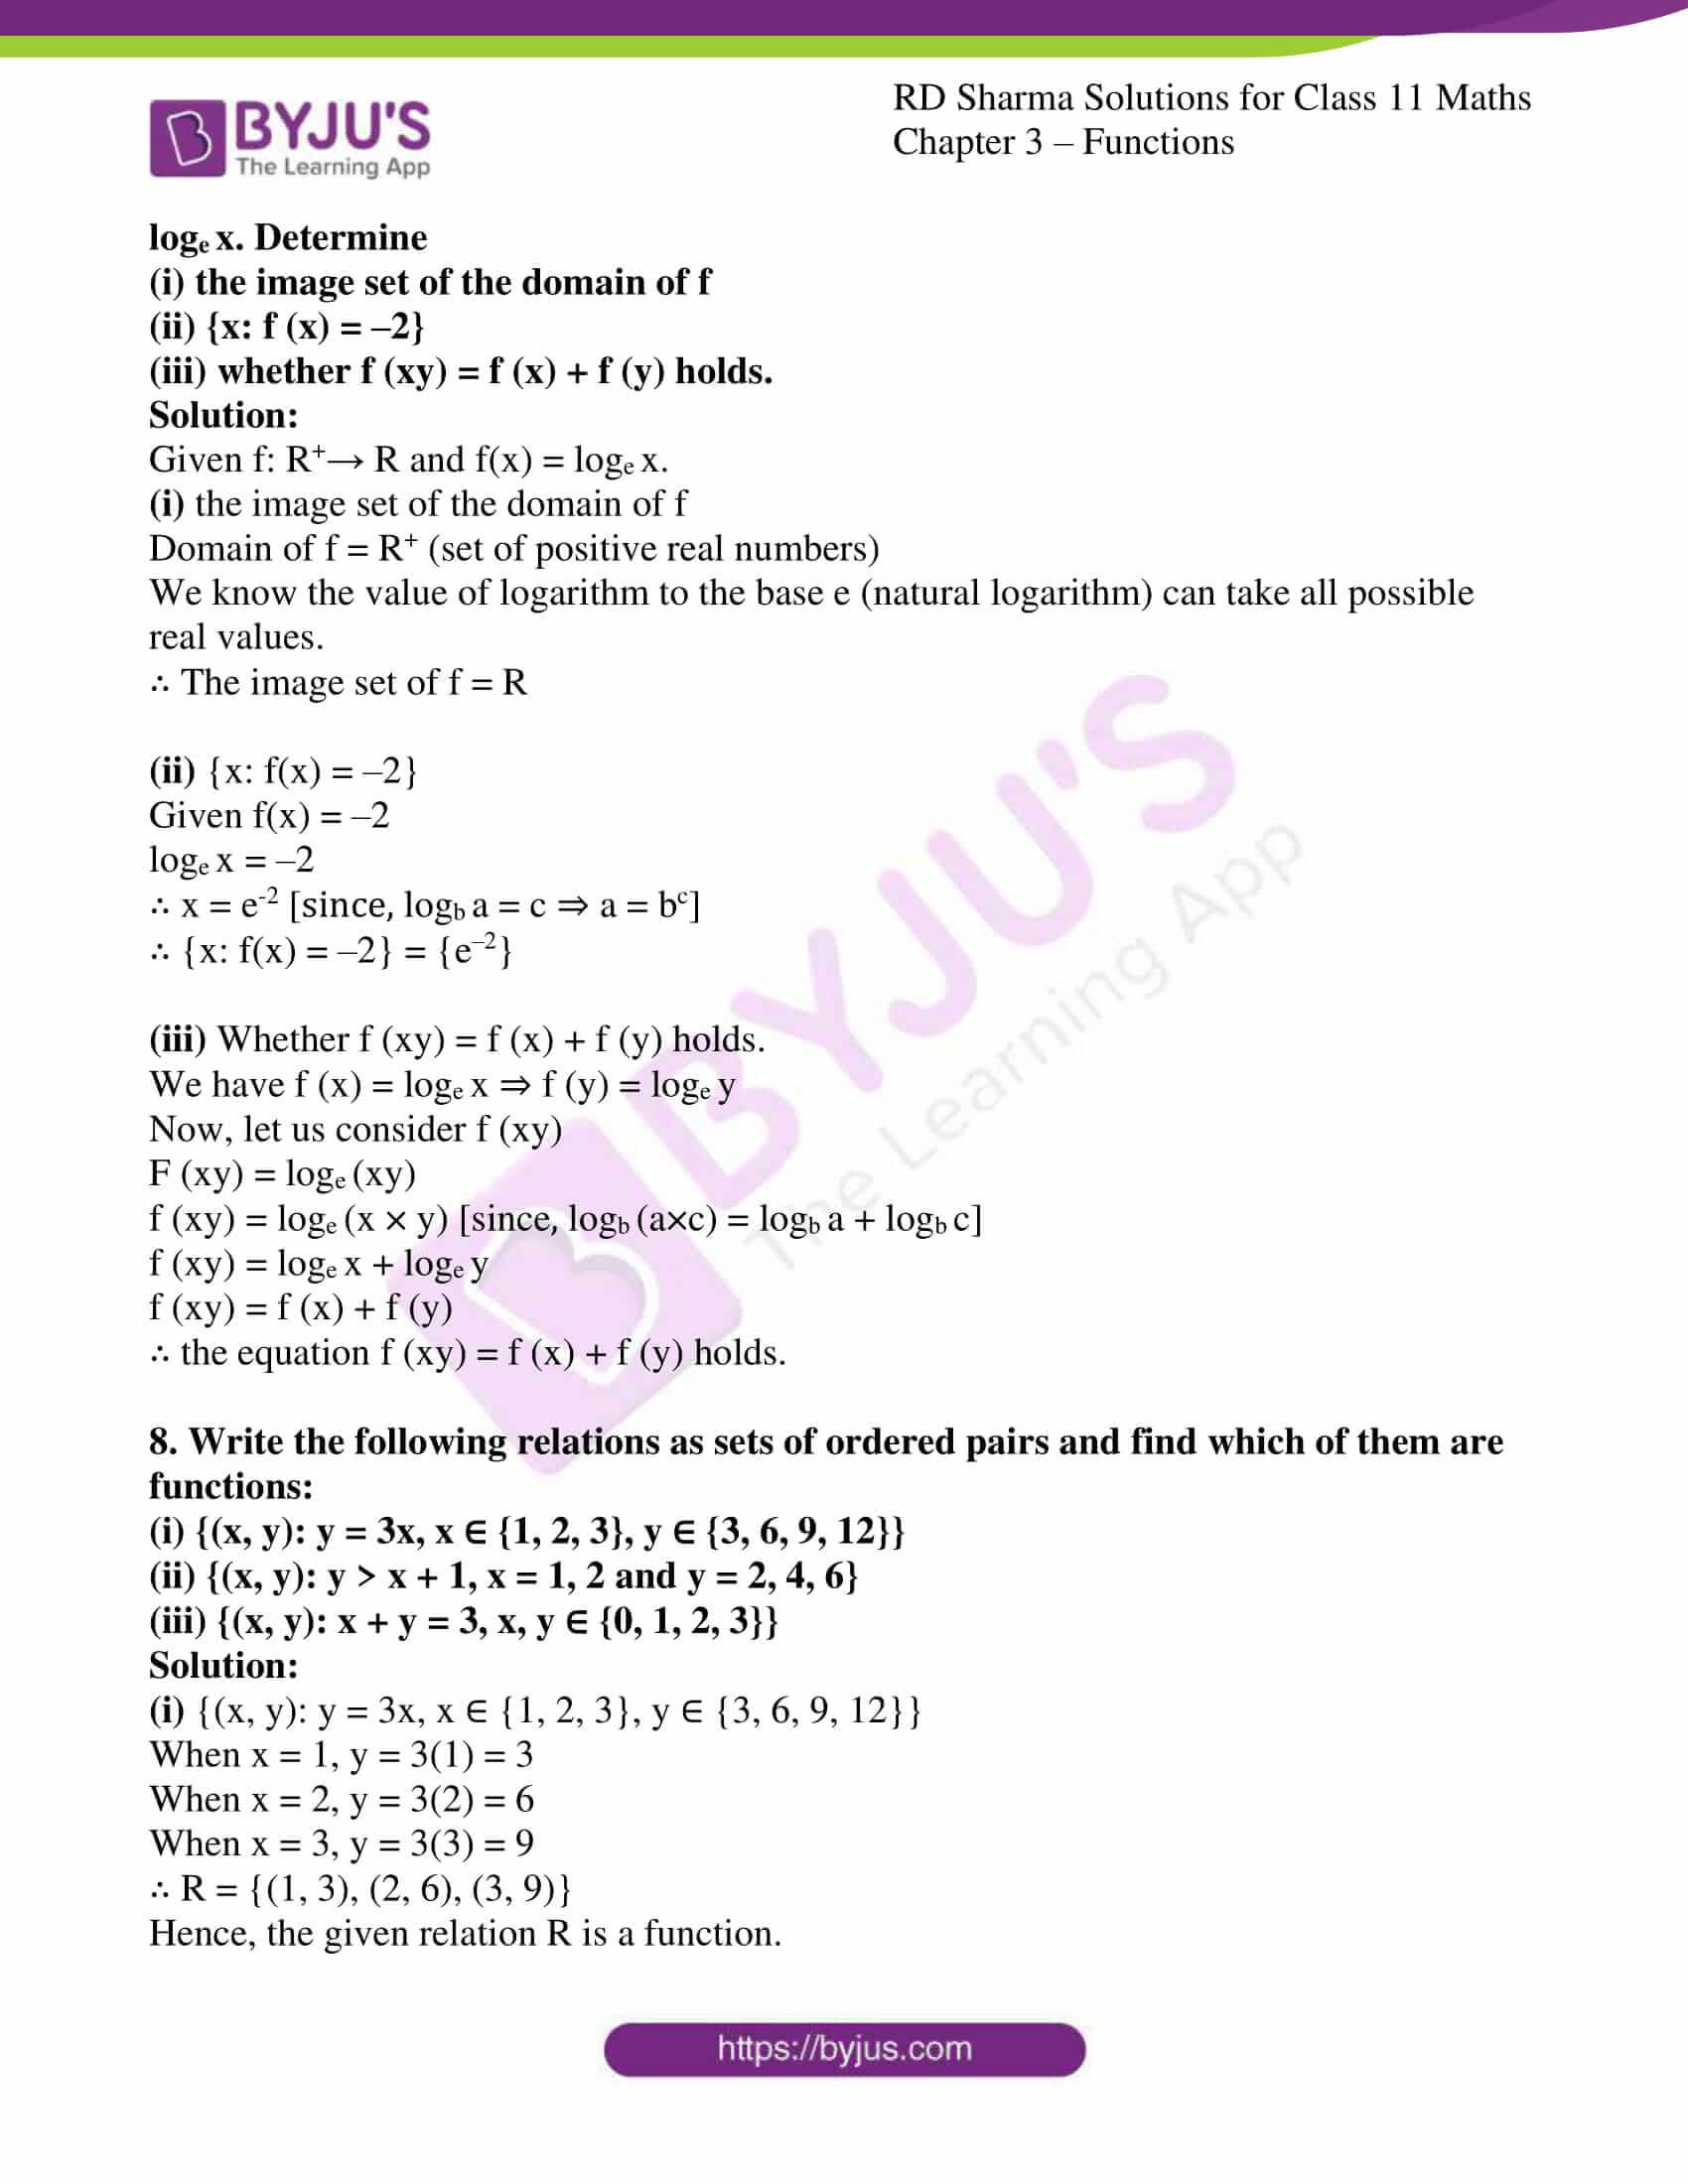 rd sharma class 11 maths ch 3 functions ex 1 5